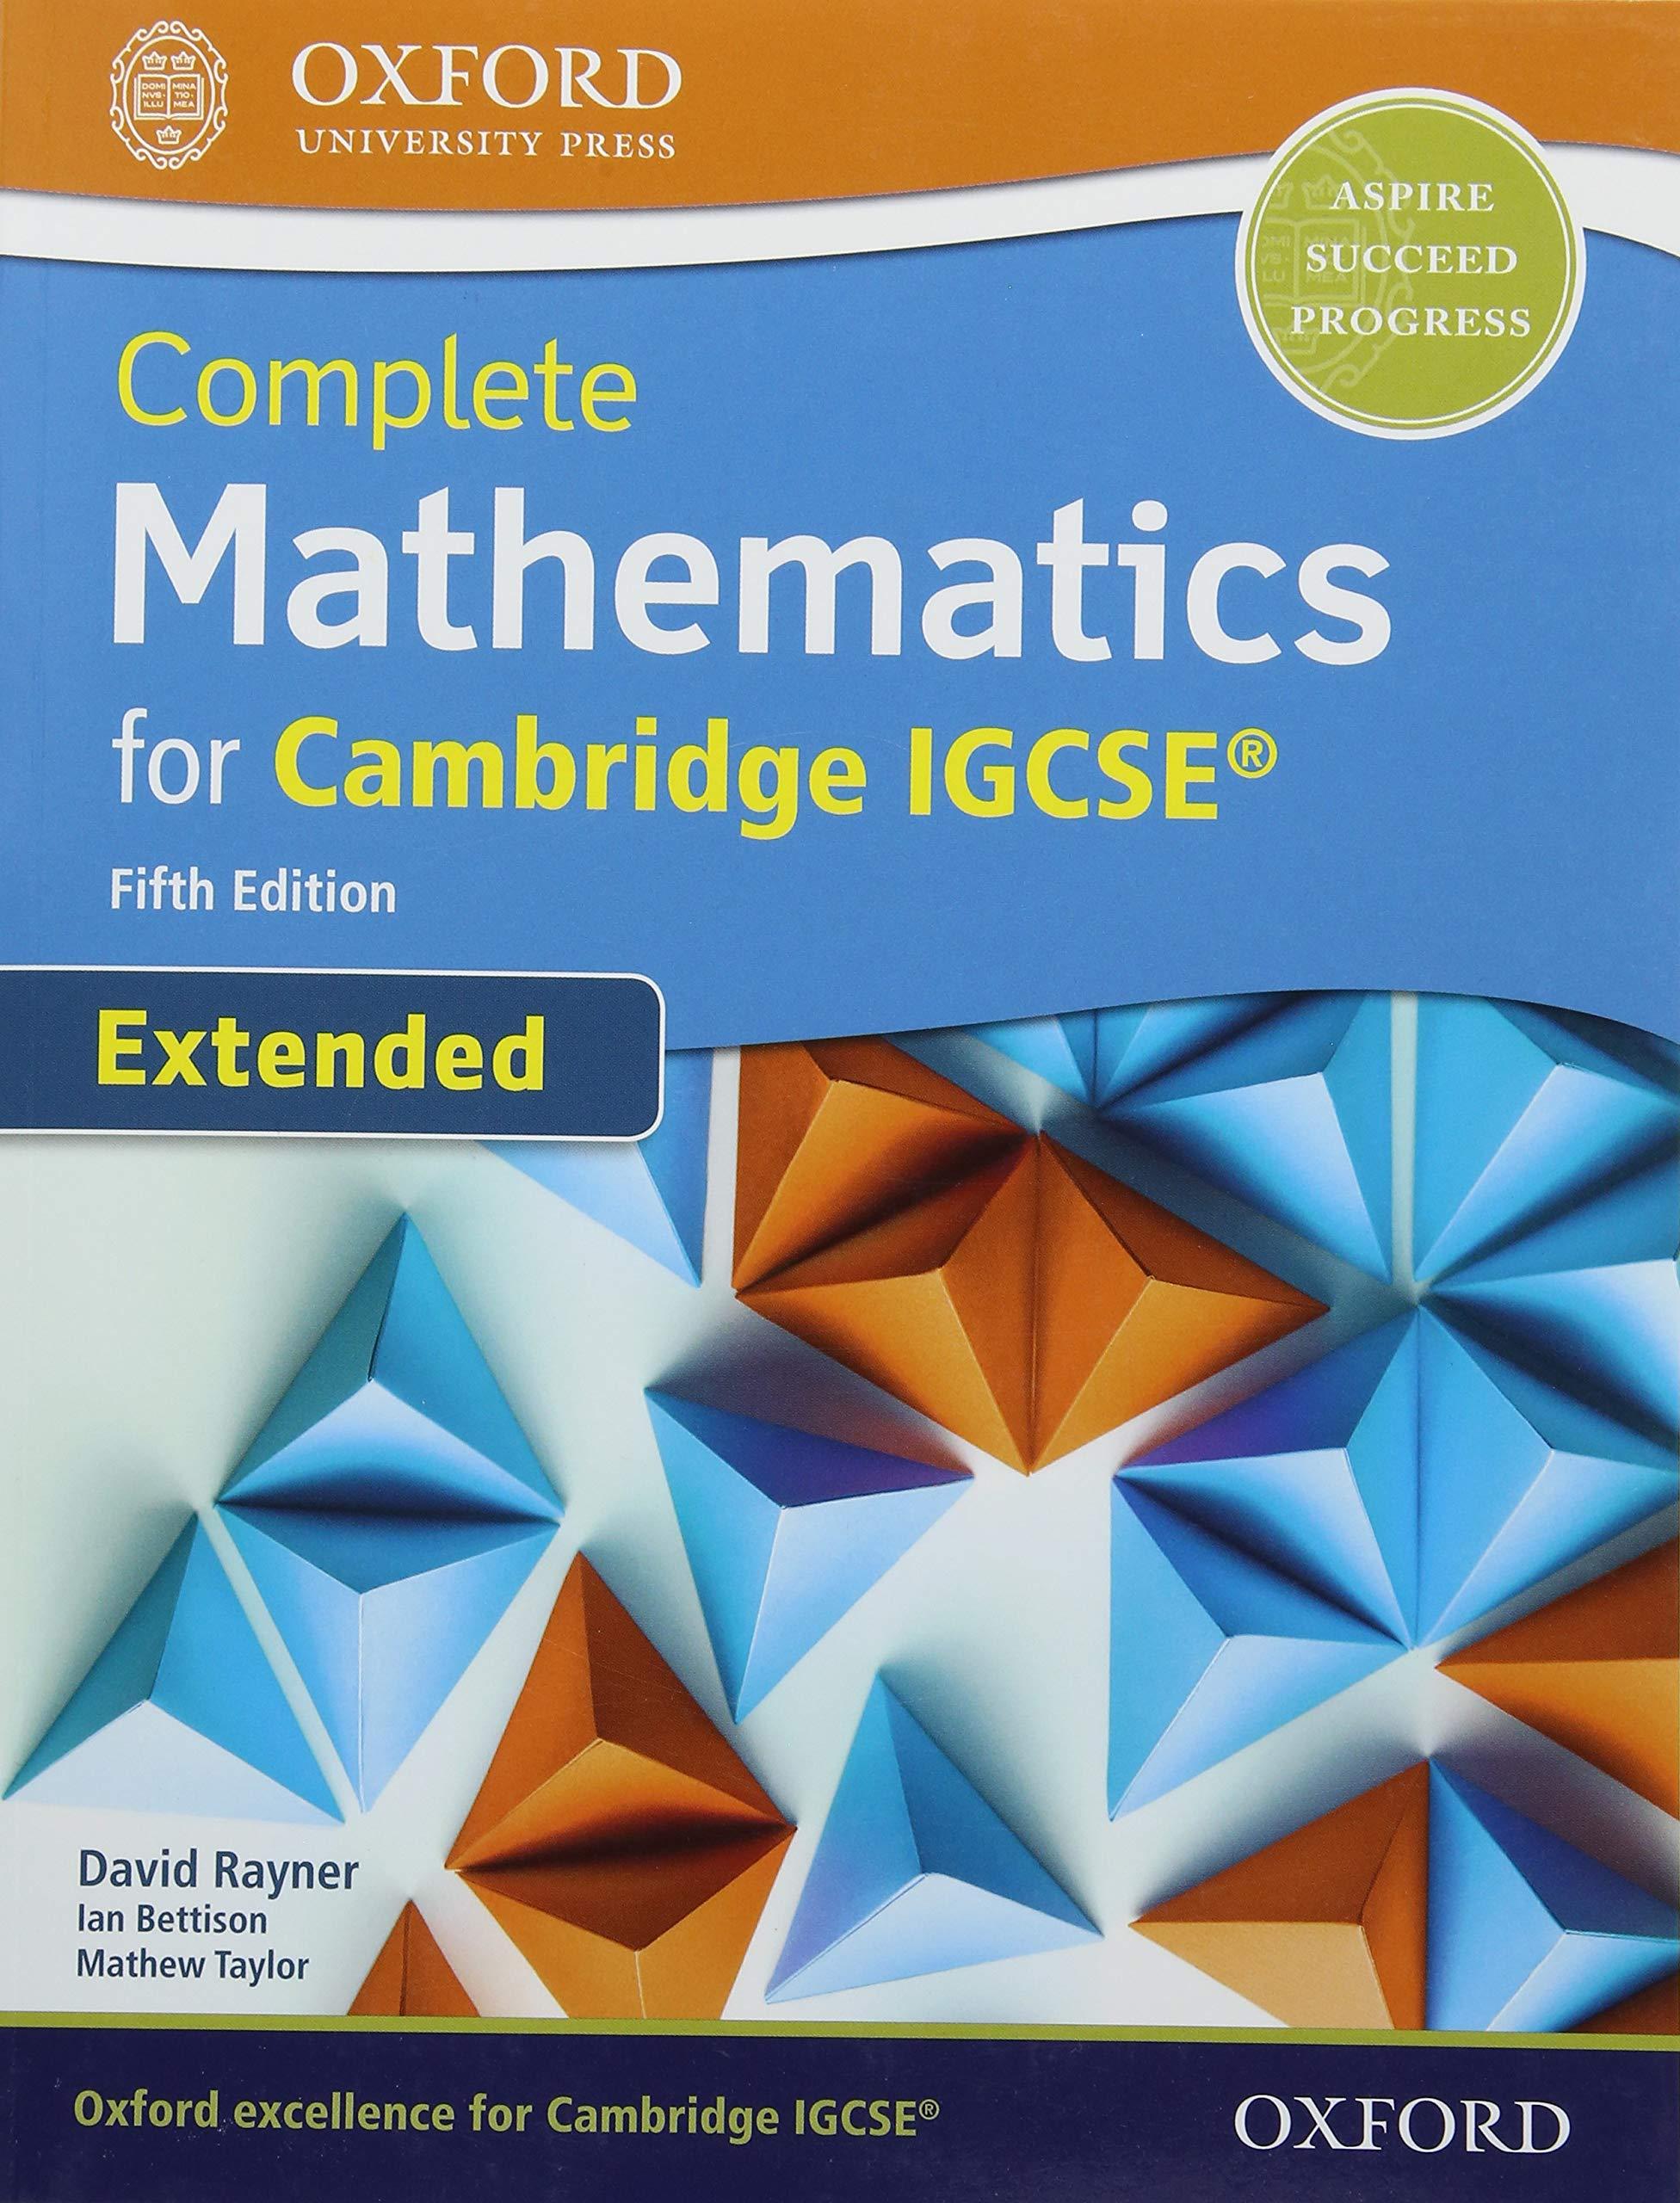 Extended mathematics for igcse david rayner e-books free